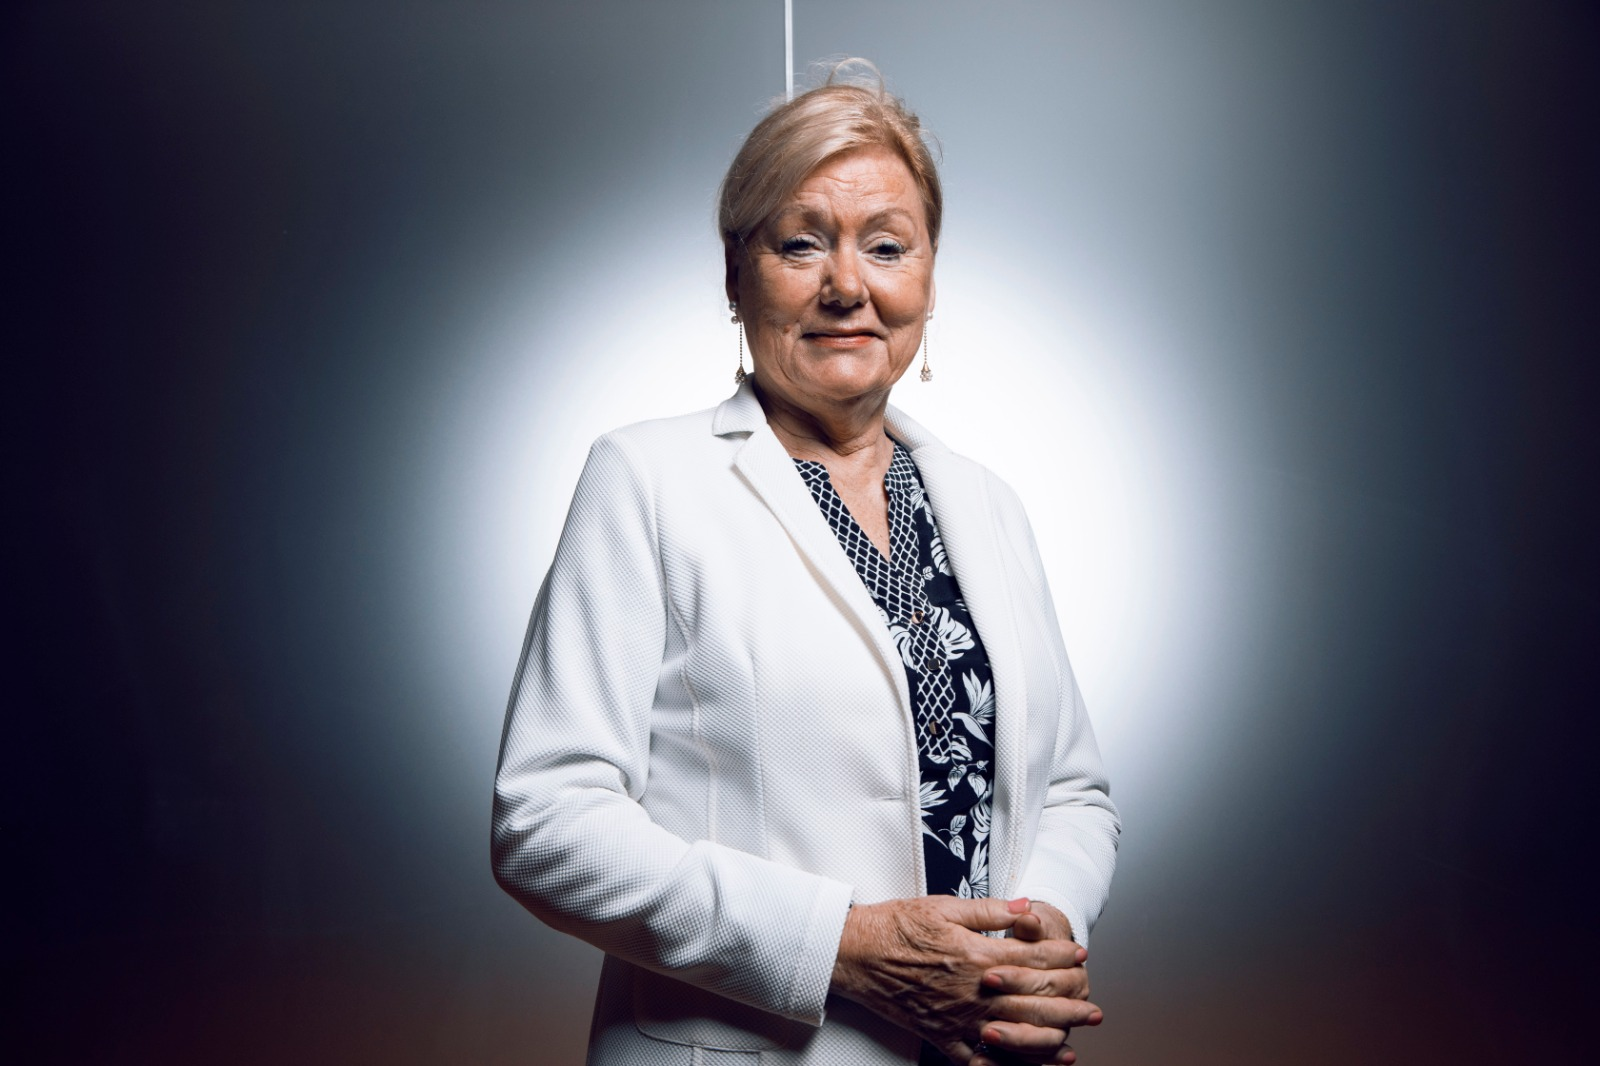 Kathe Andersen